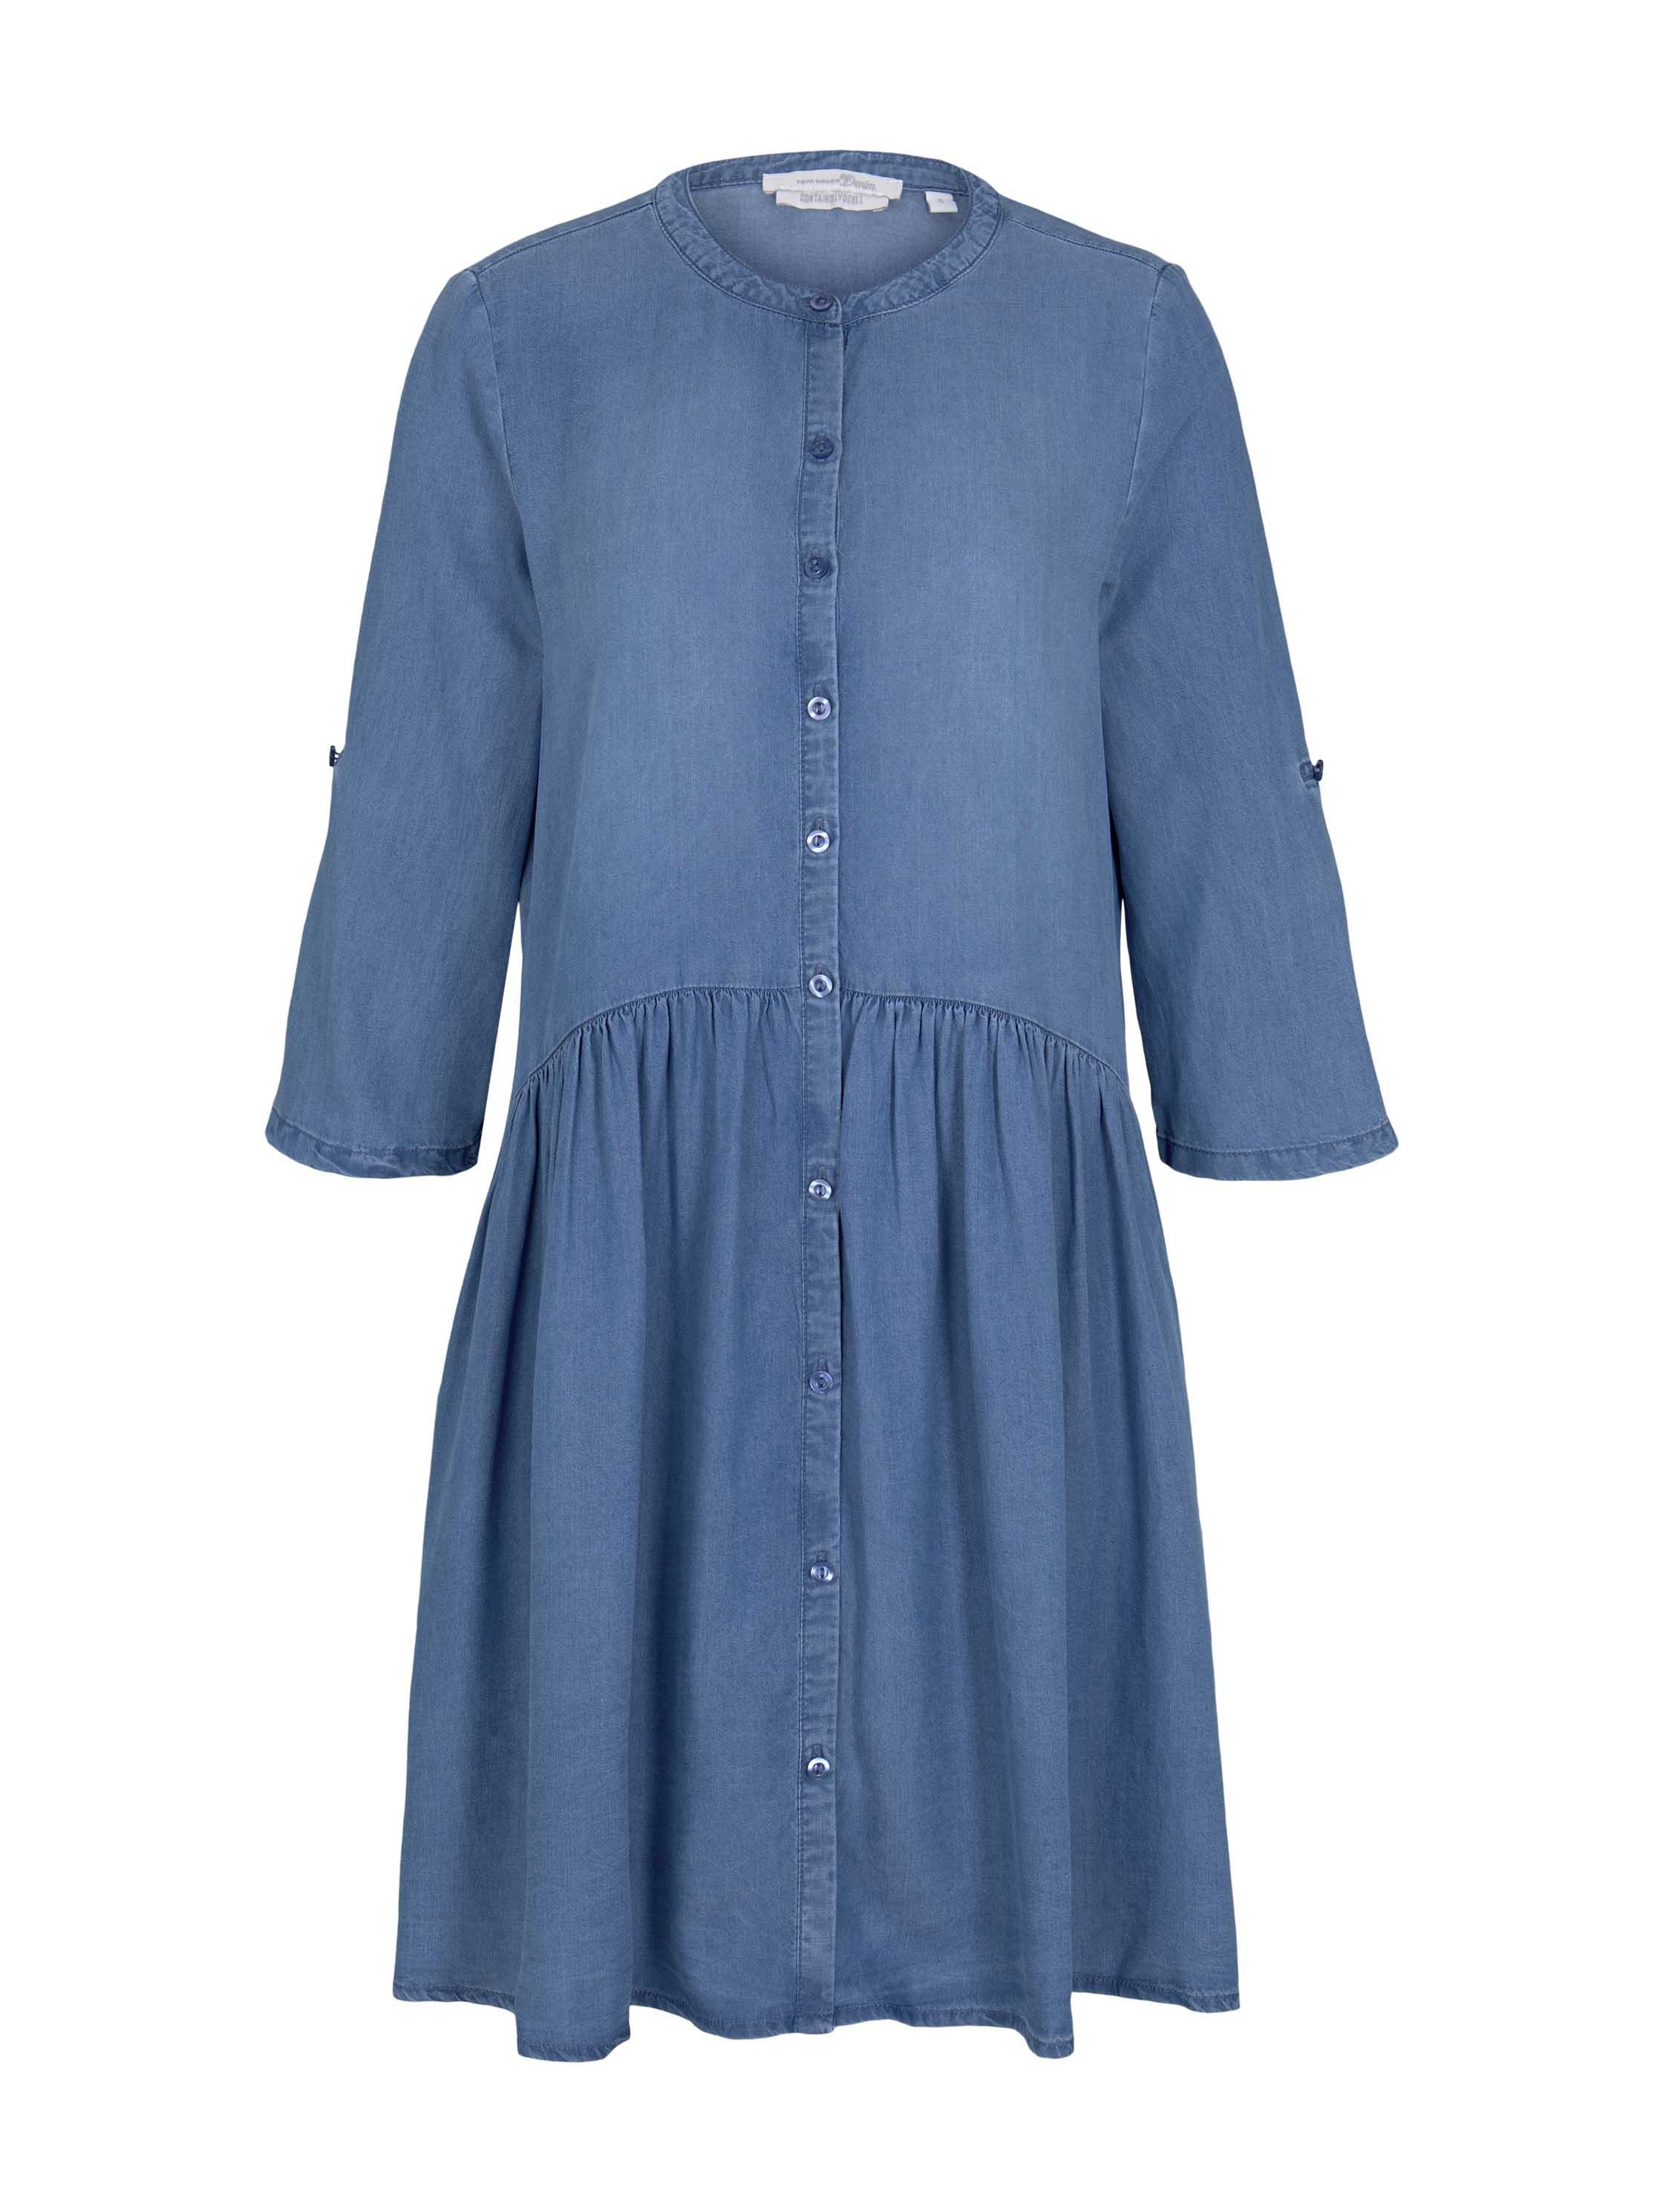 denim dress with placket